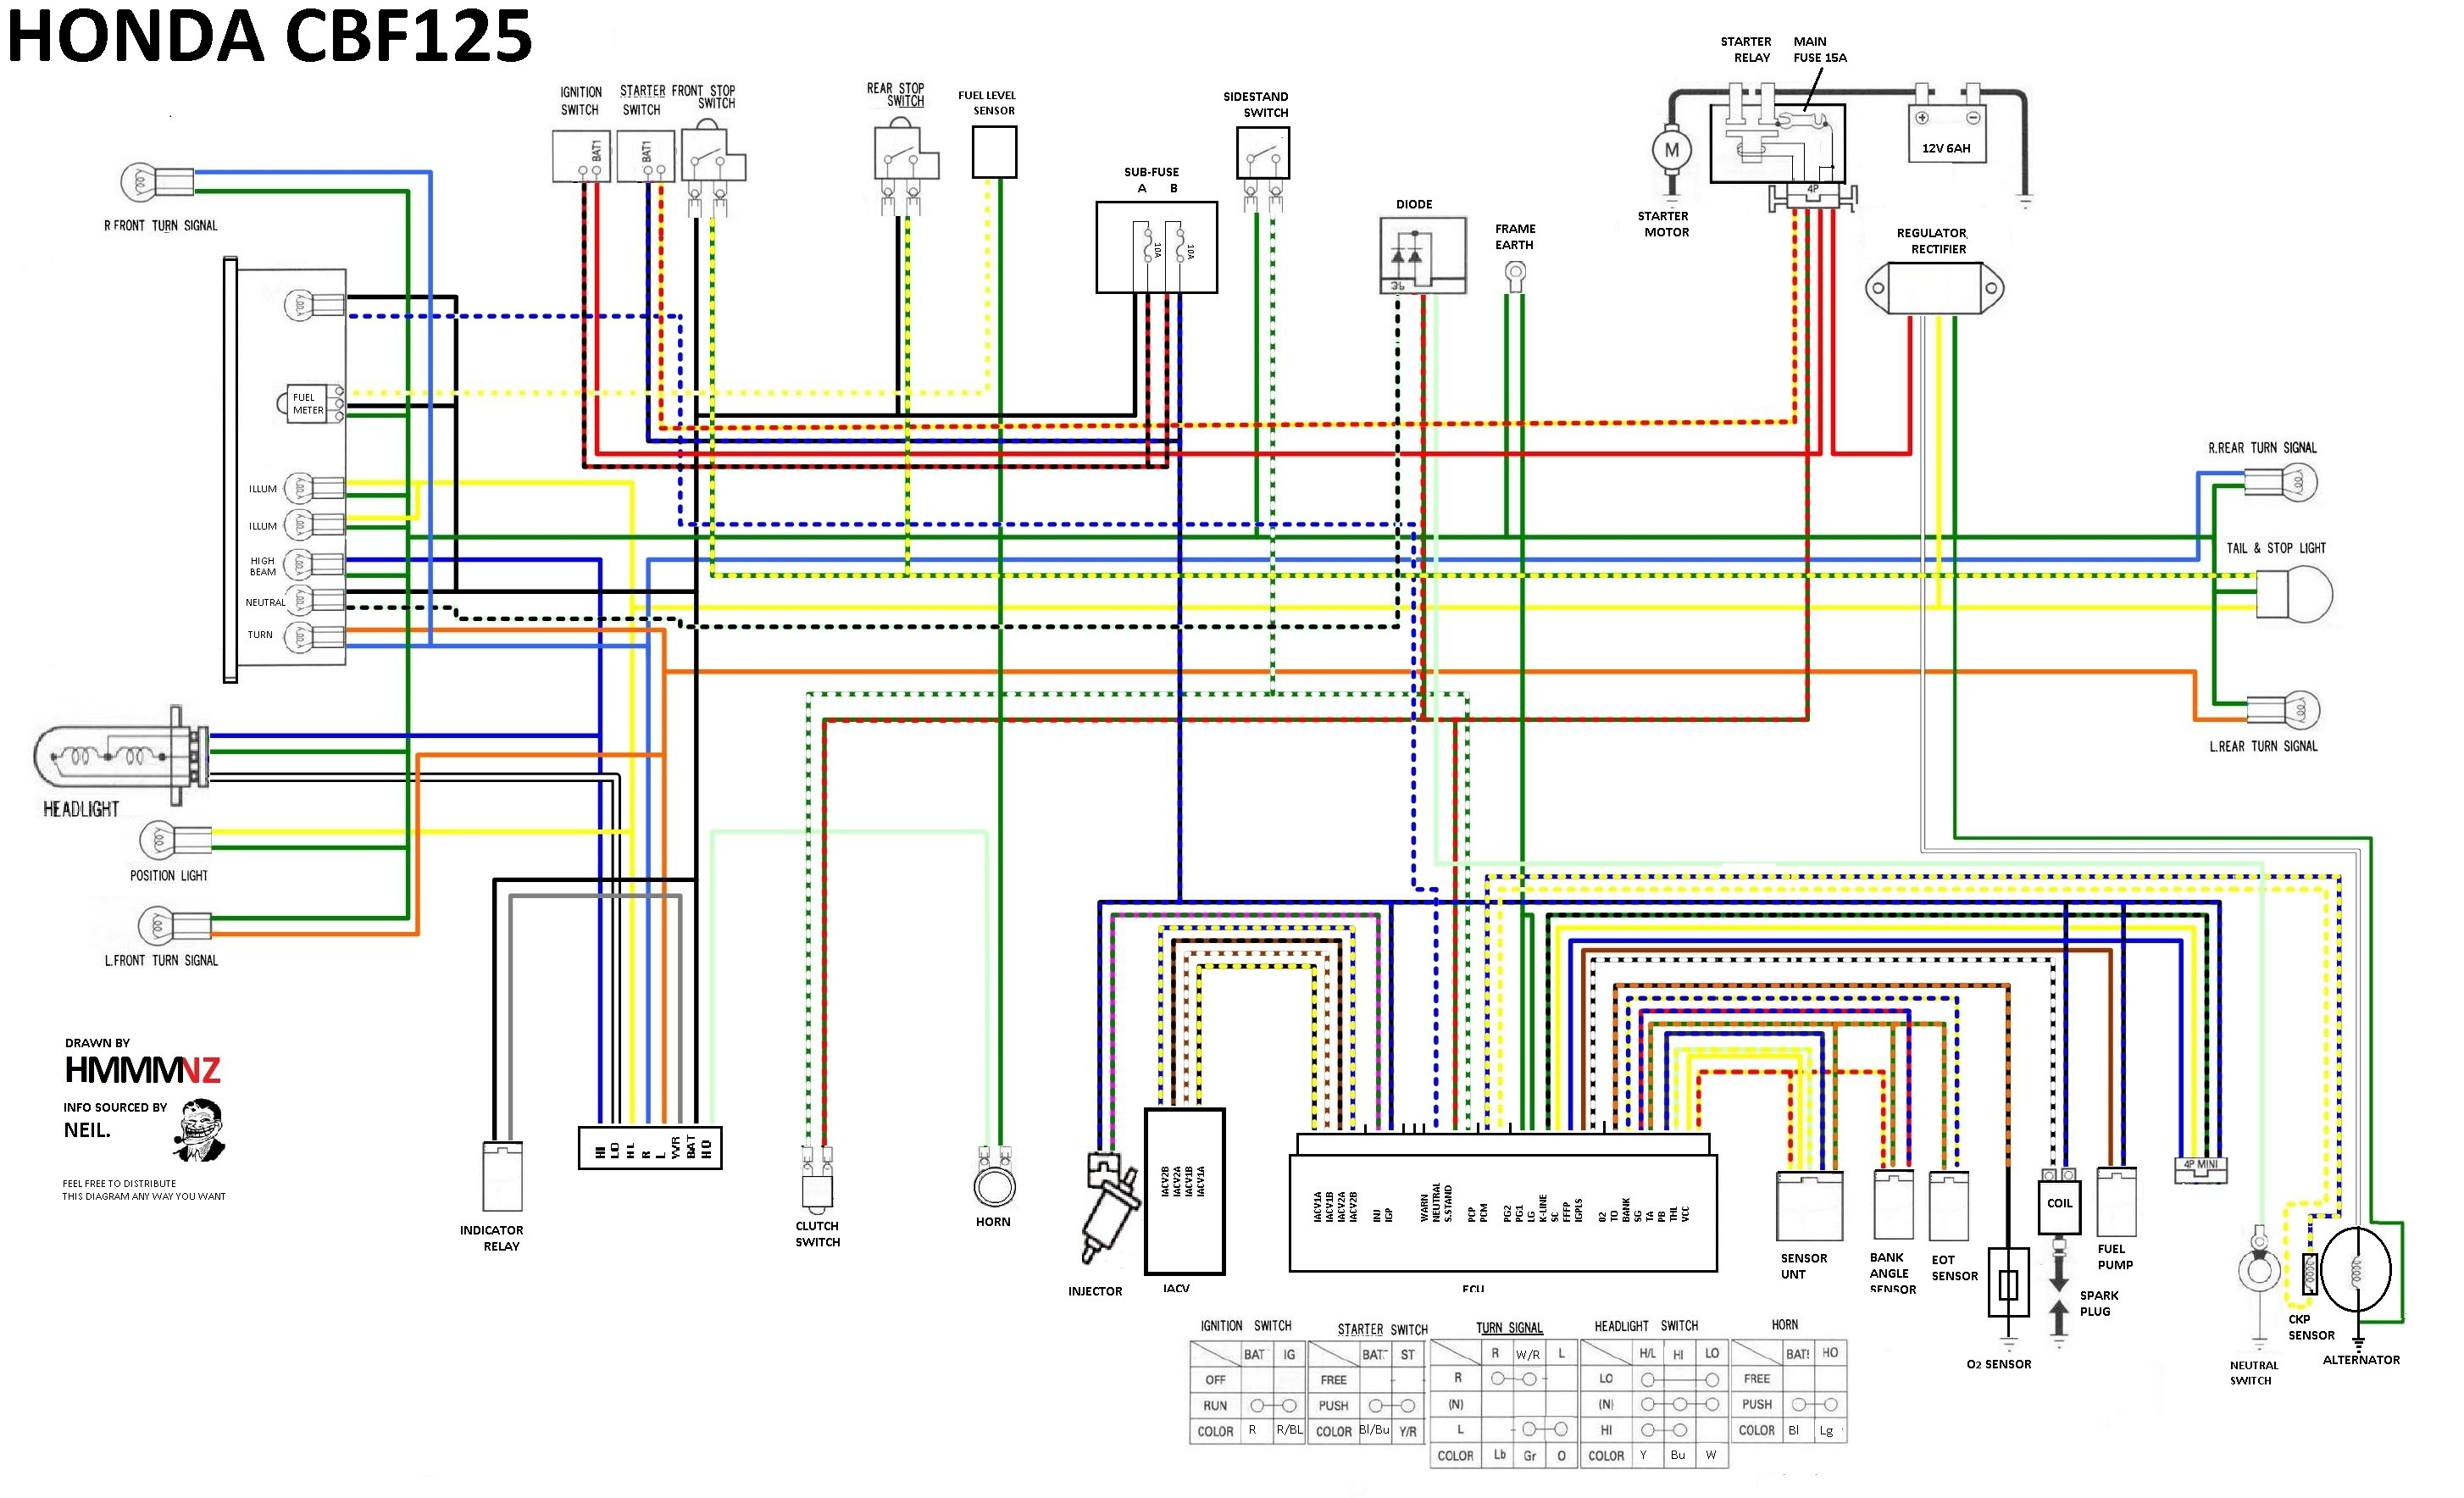 Colour Wiring Diagram For Cbf125